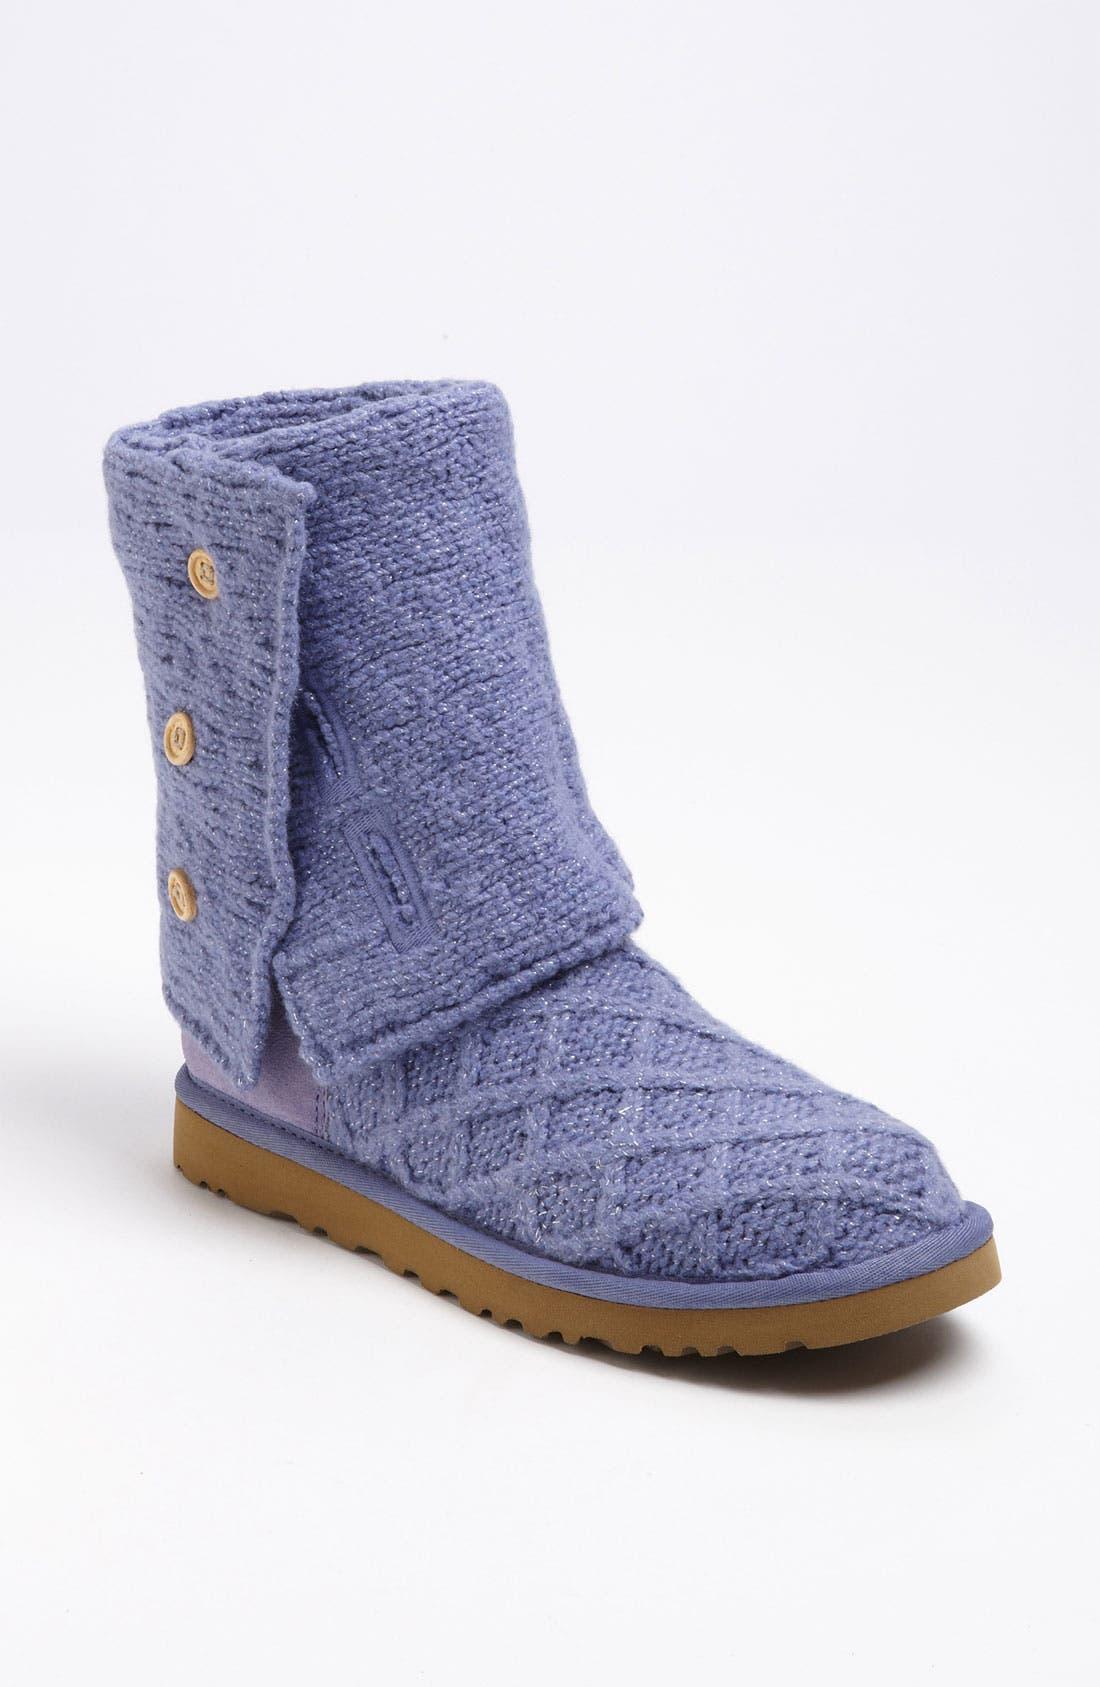 Alternate Image 1 Selected - UGG® Australia 'Lattice Cardy' Boot